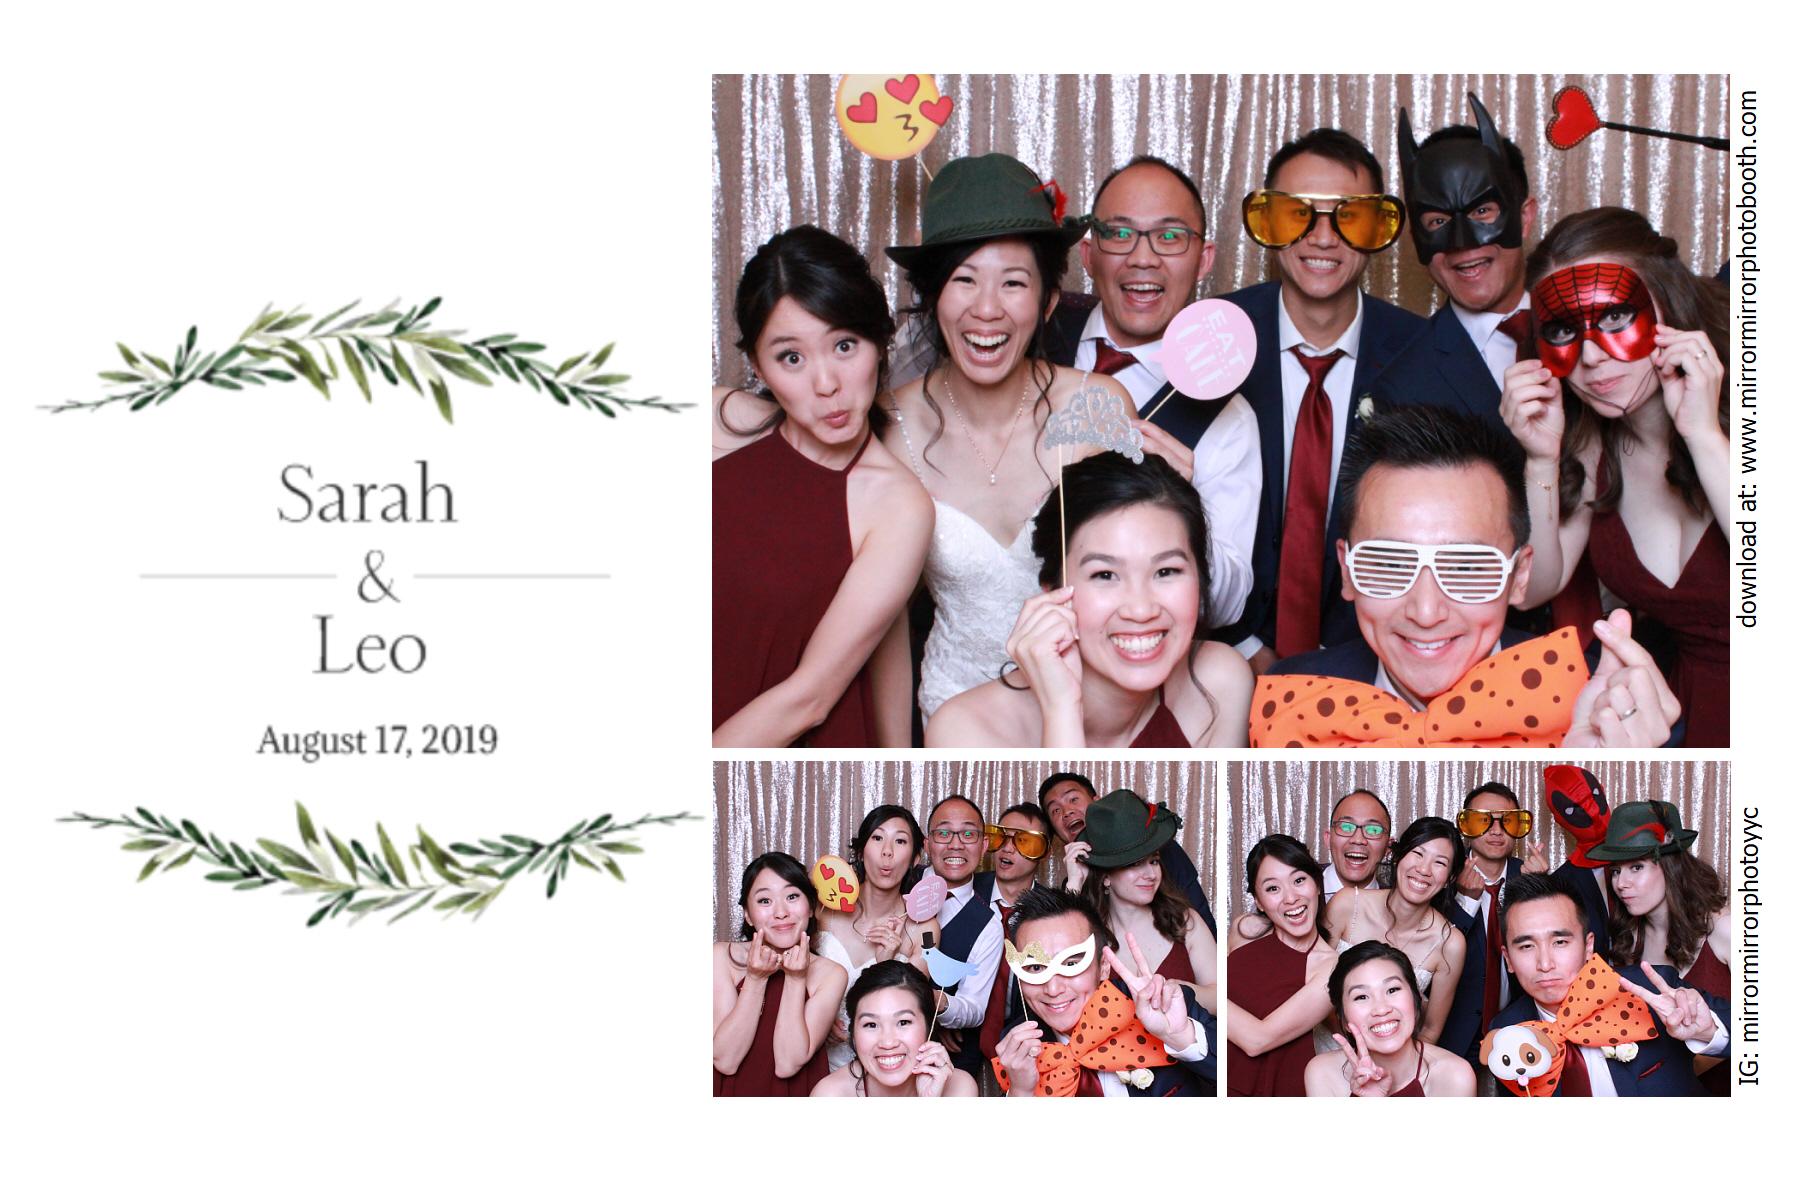 Sarah & Leo's Wedding - Aug 17, 2019